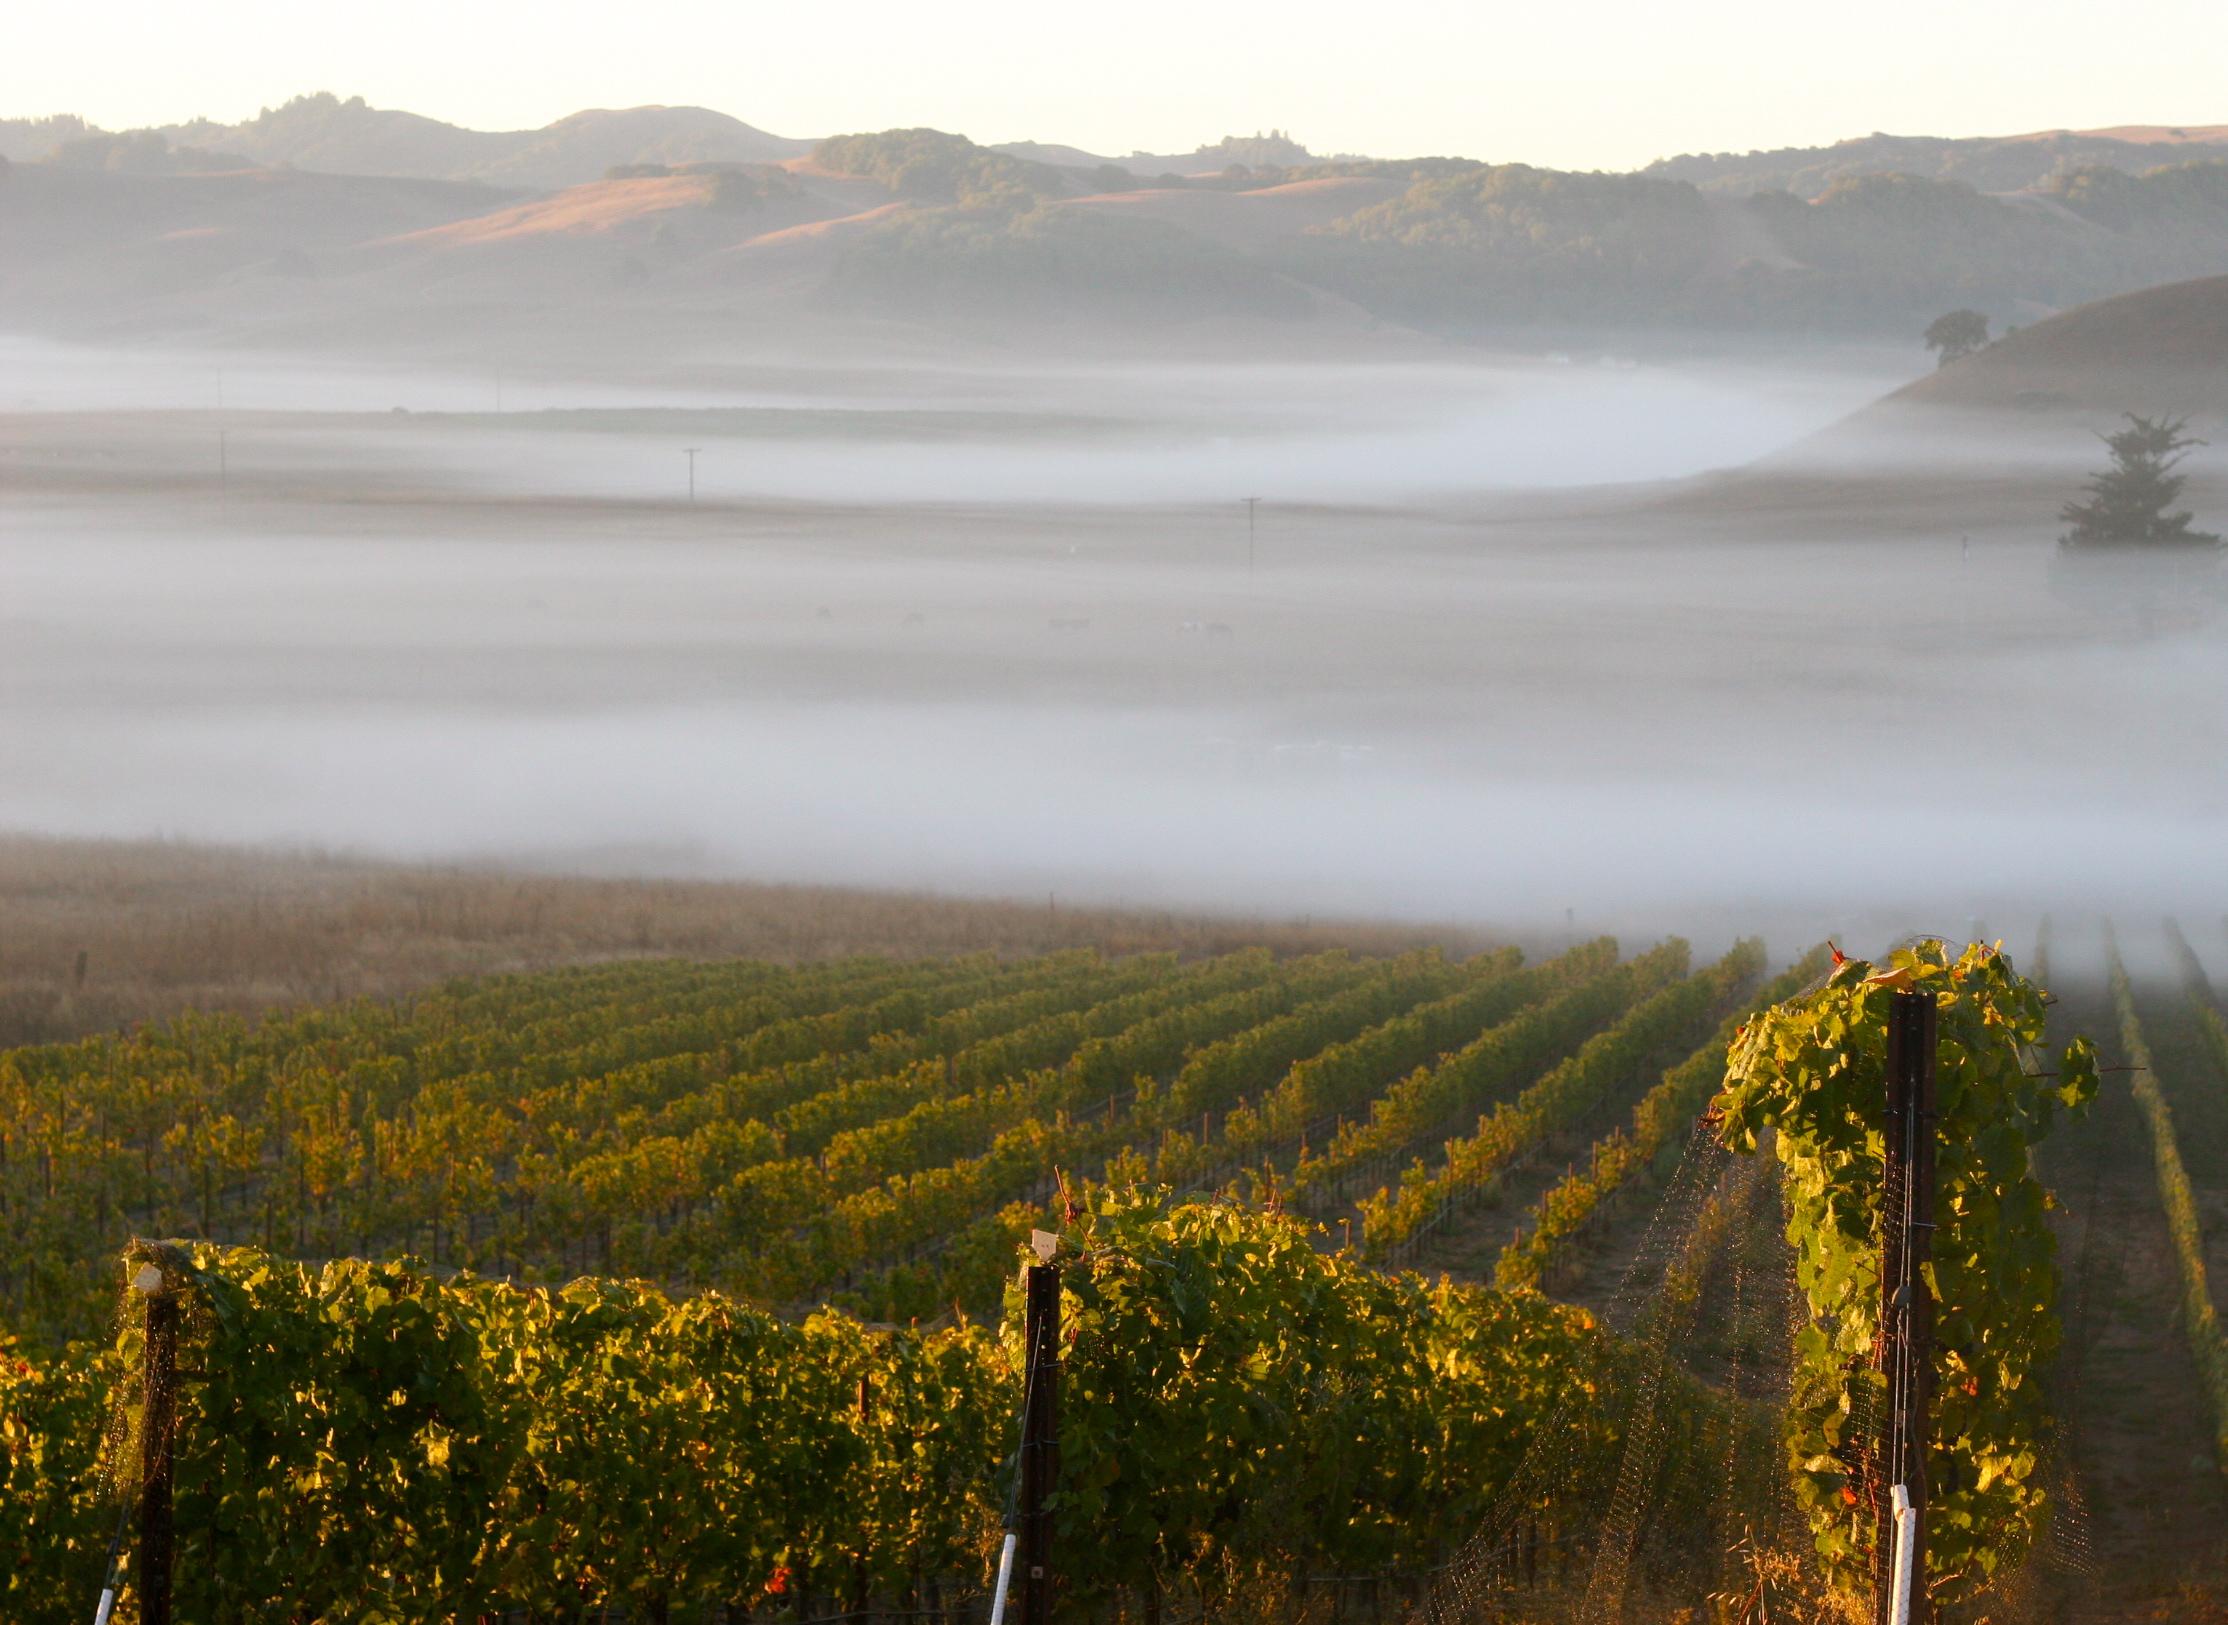 mcevoy-ranch-fog-in-petaluma-gardenista